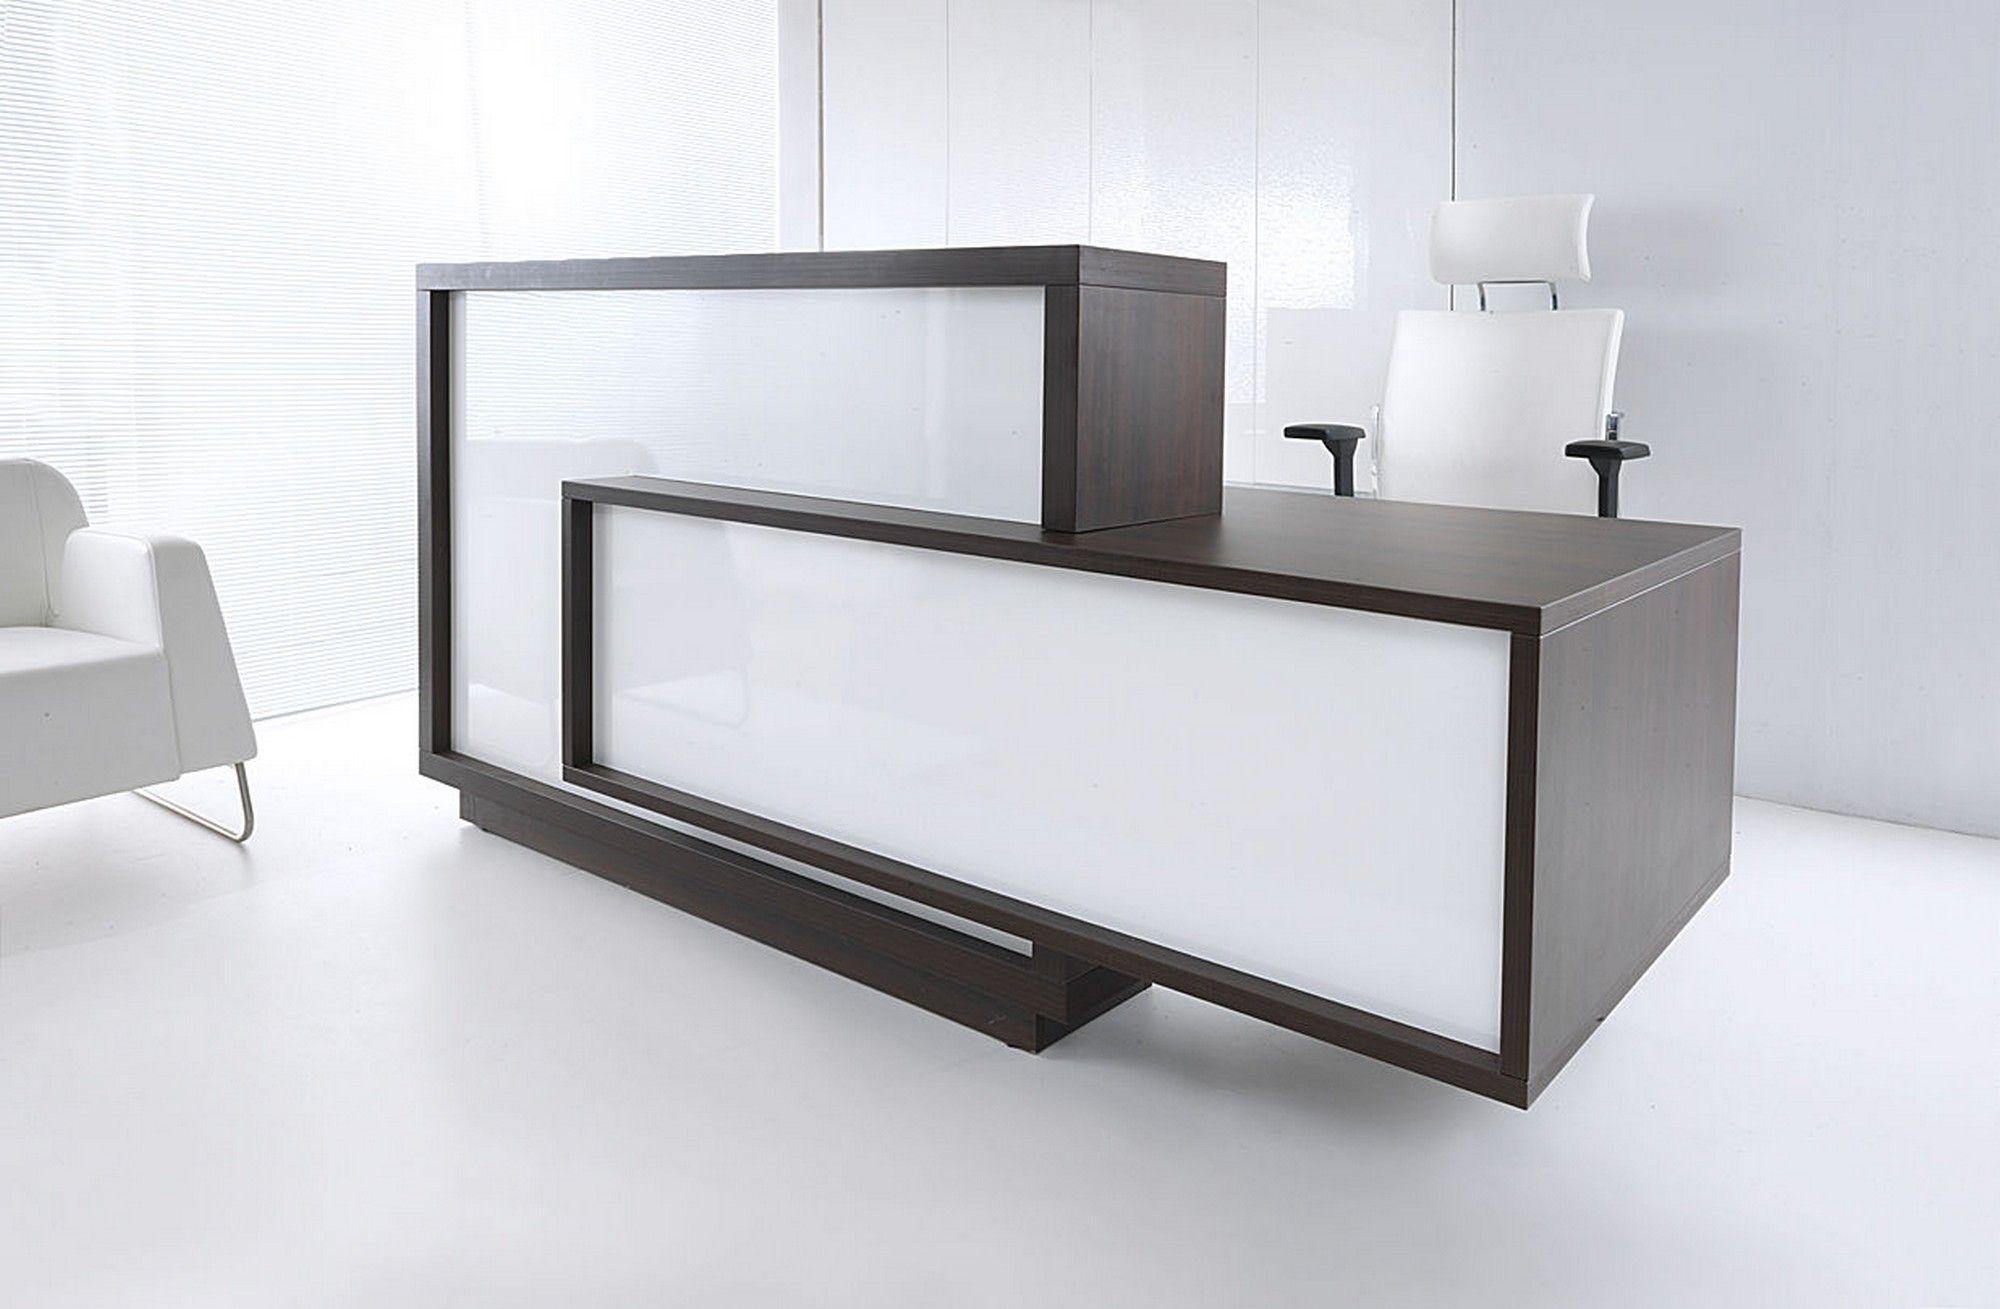 Home gt reception desks gt 8 curved maple glass top reception desk - Wood Glass Sleek Reception Desk